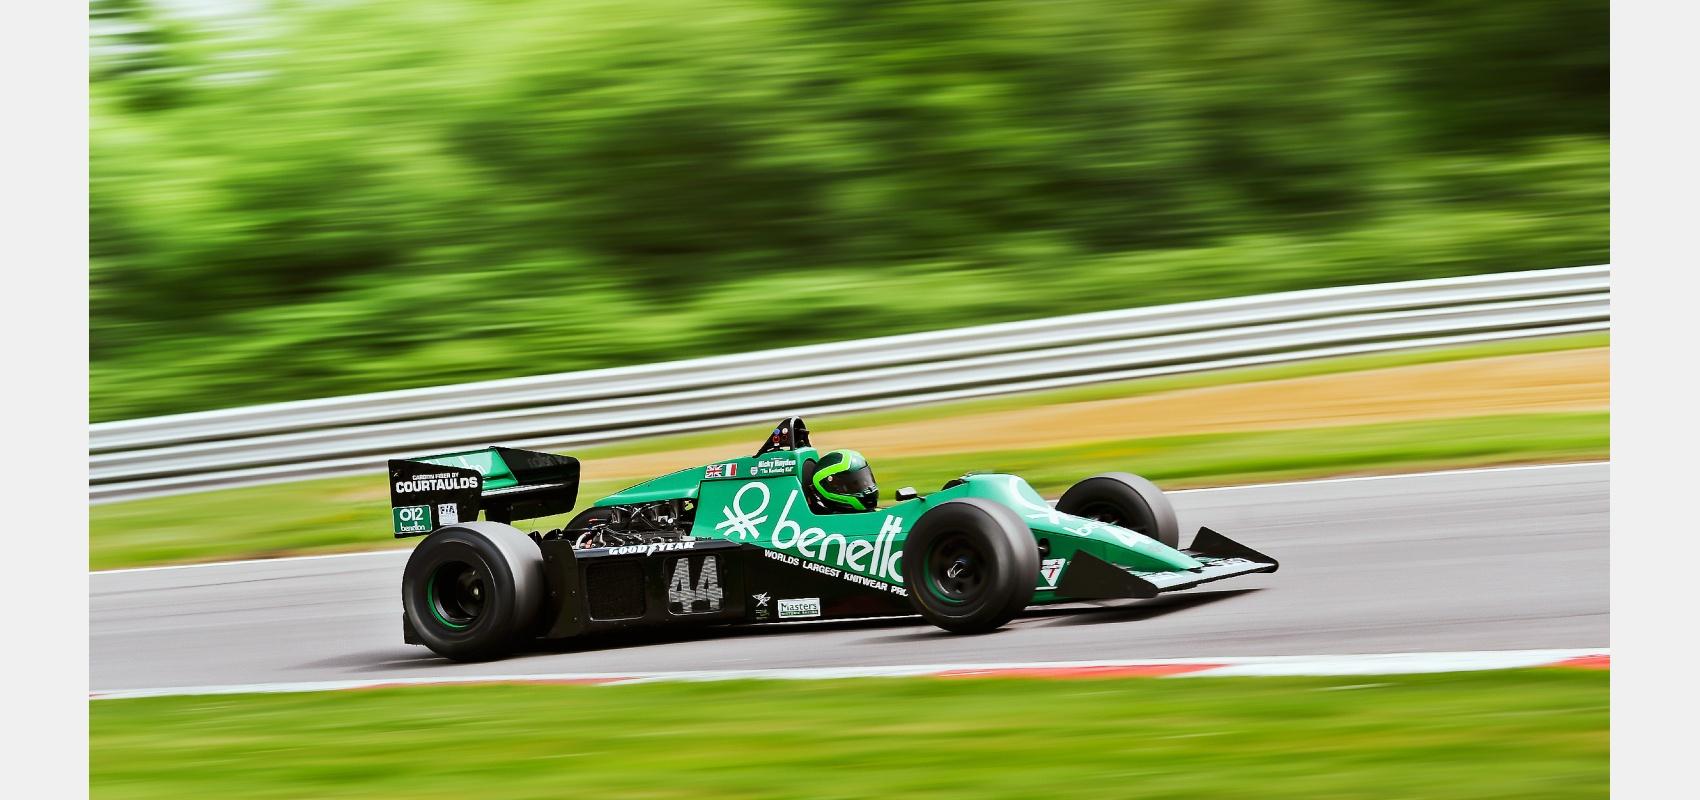 Motorsport - F1 Masters Championship, Tyrrell 012, Formula 1 car.